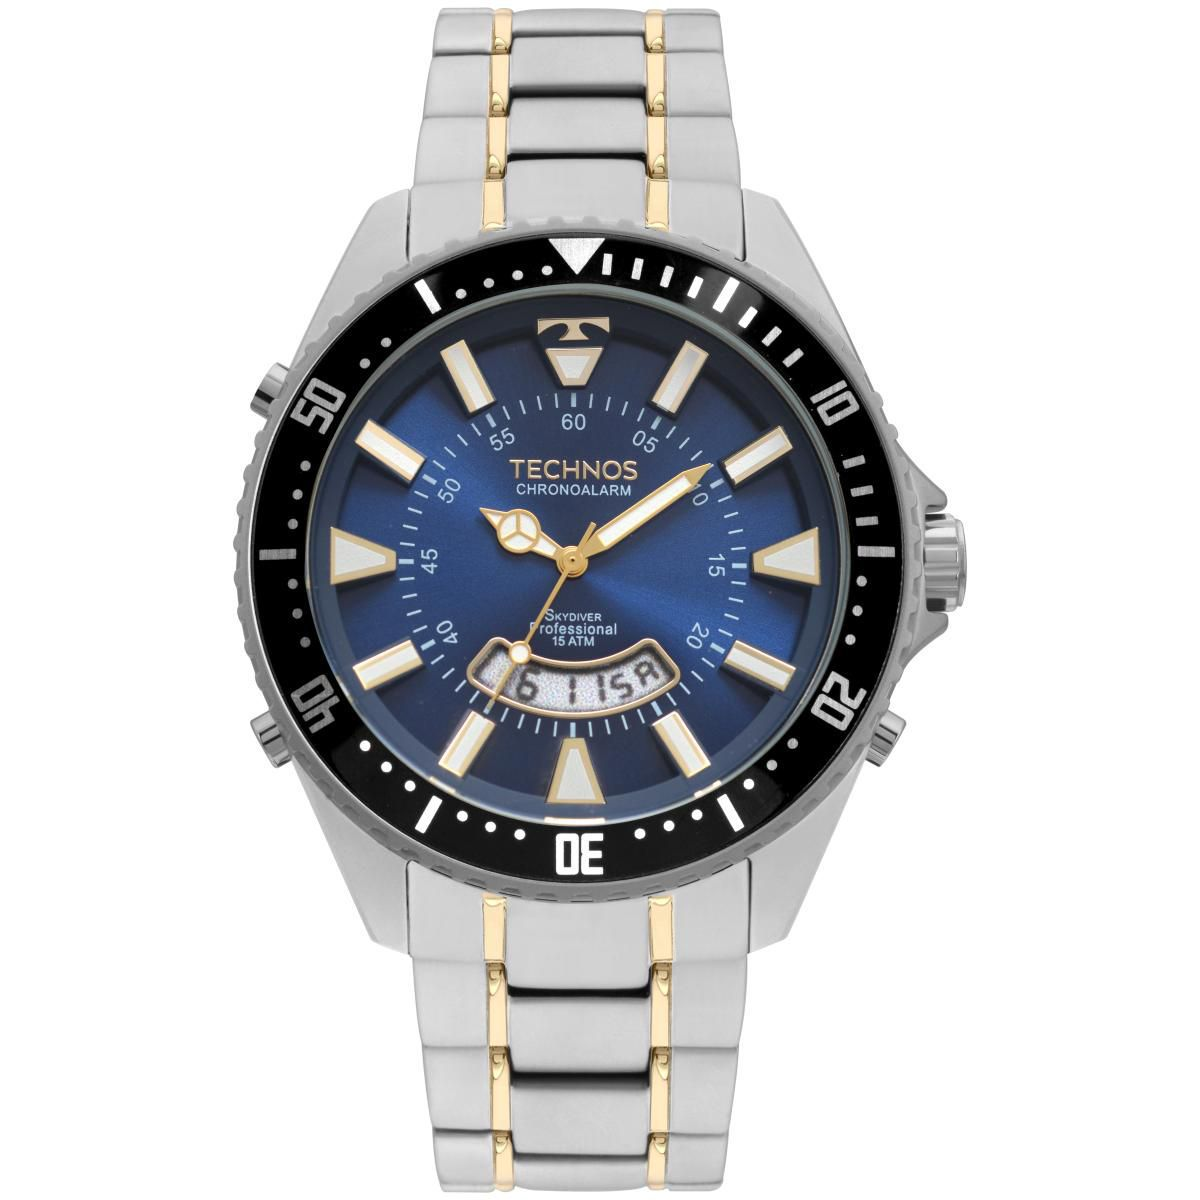 Relógio Masculino Technos T205JH/1A 48mm Aço Bicolor Prata/Dourado